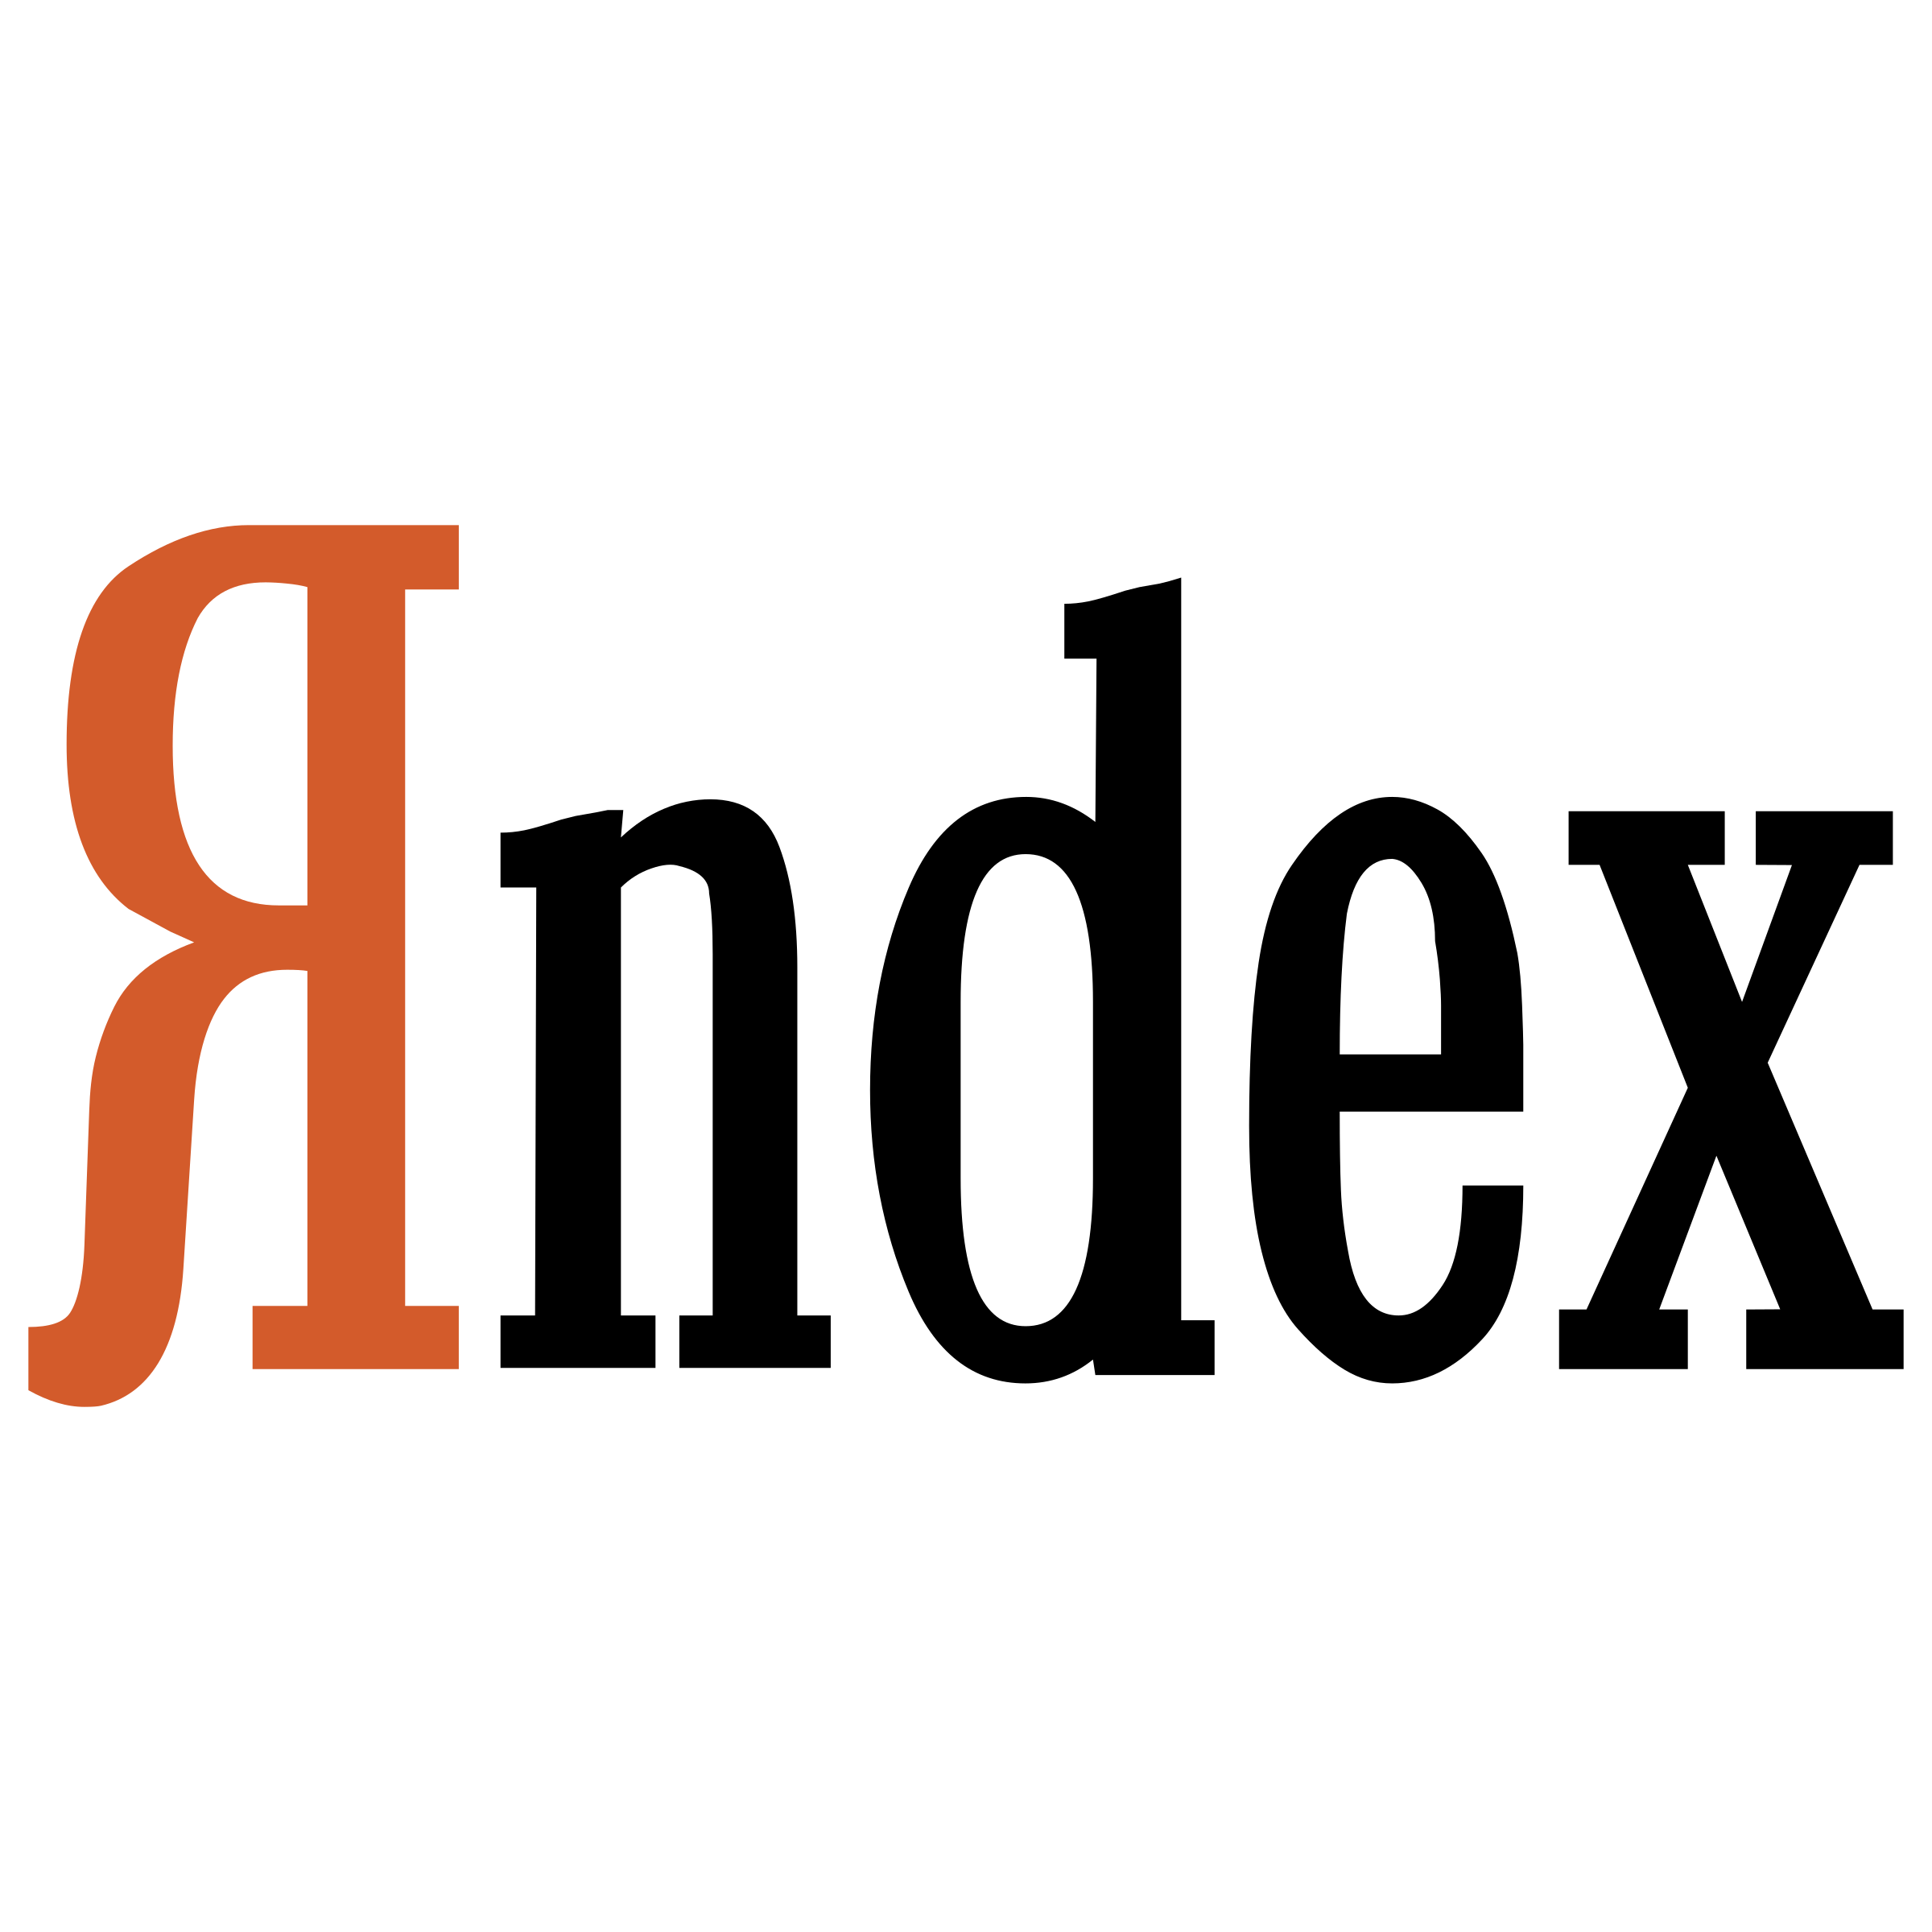 Yandex logo PNG images